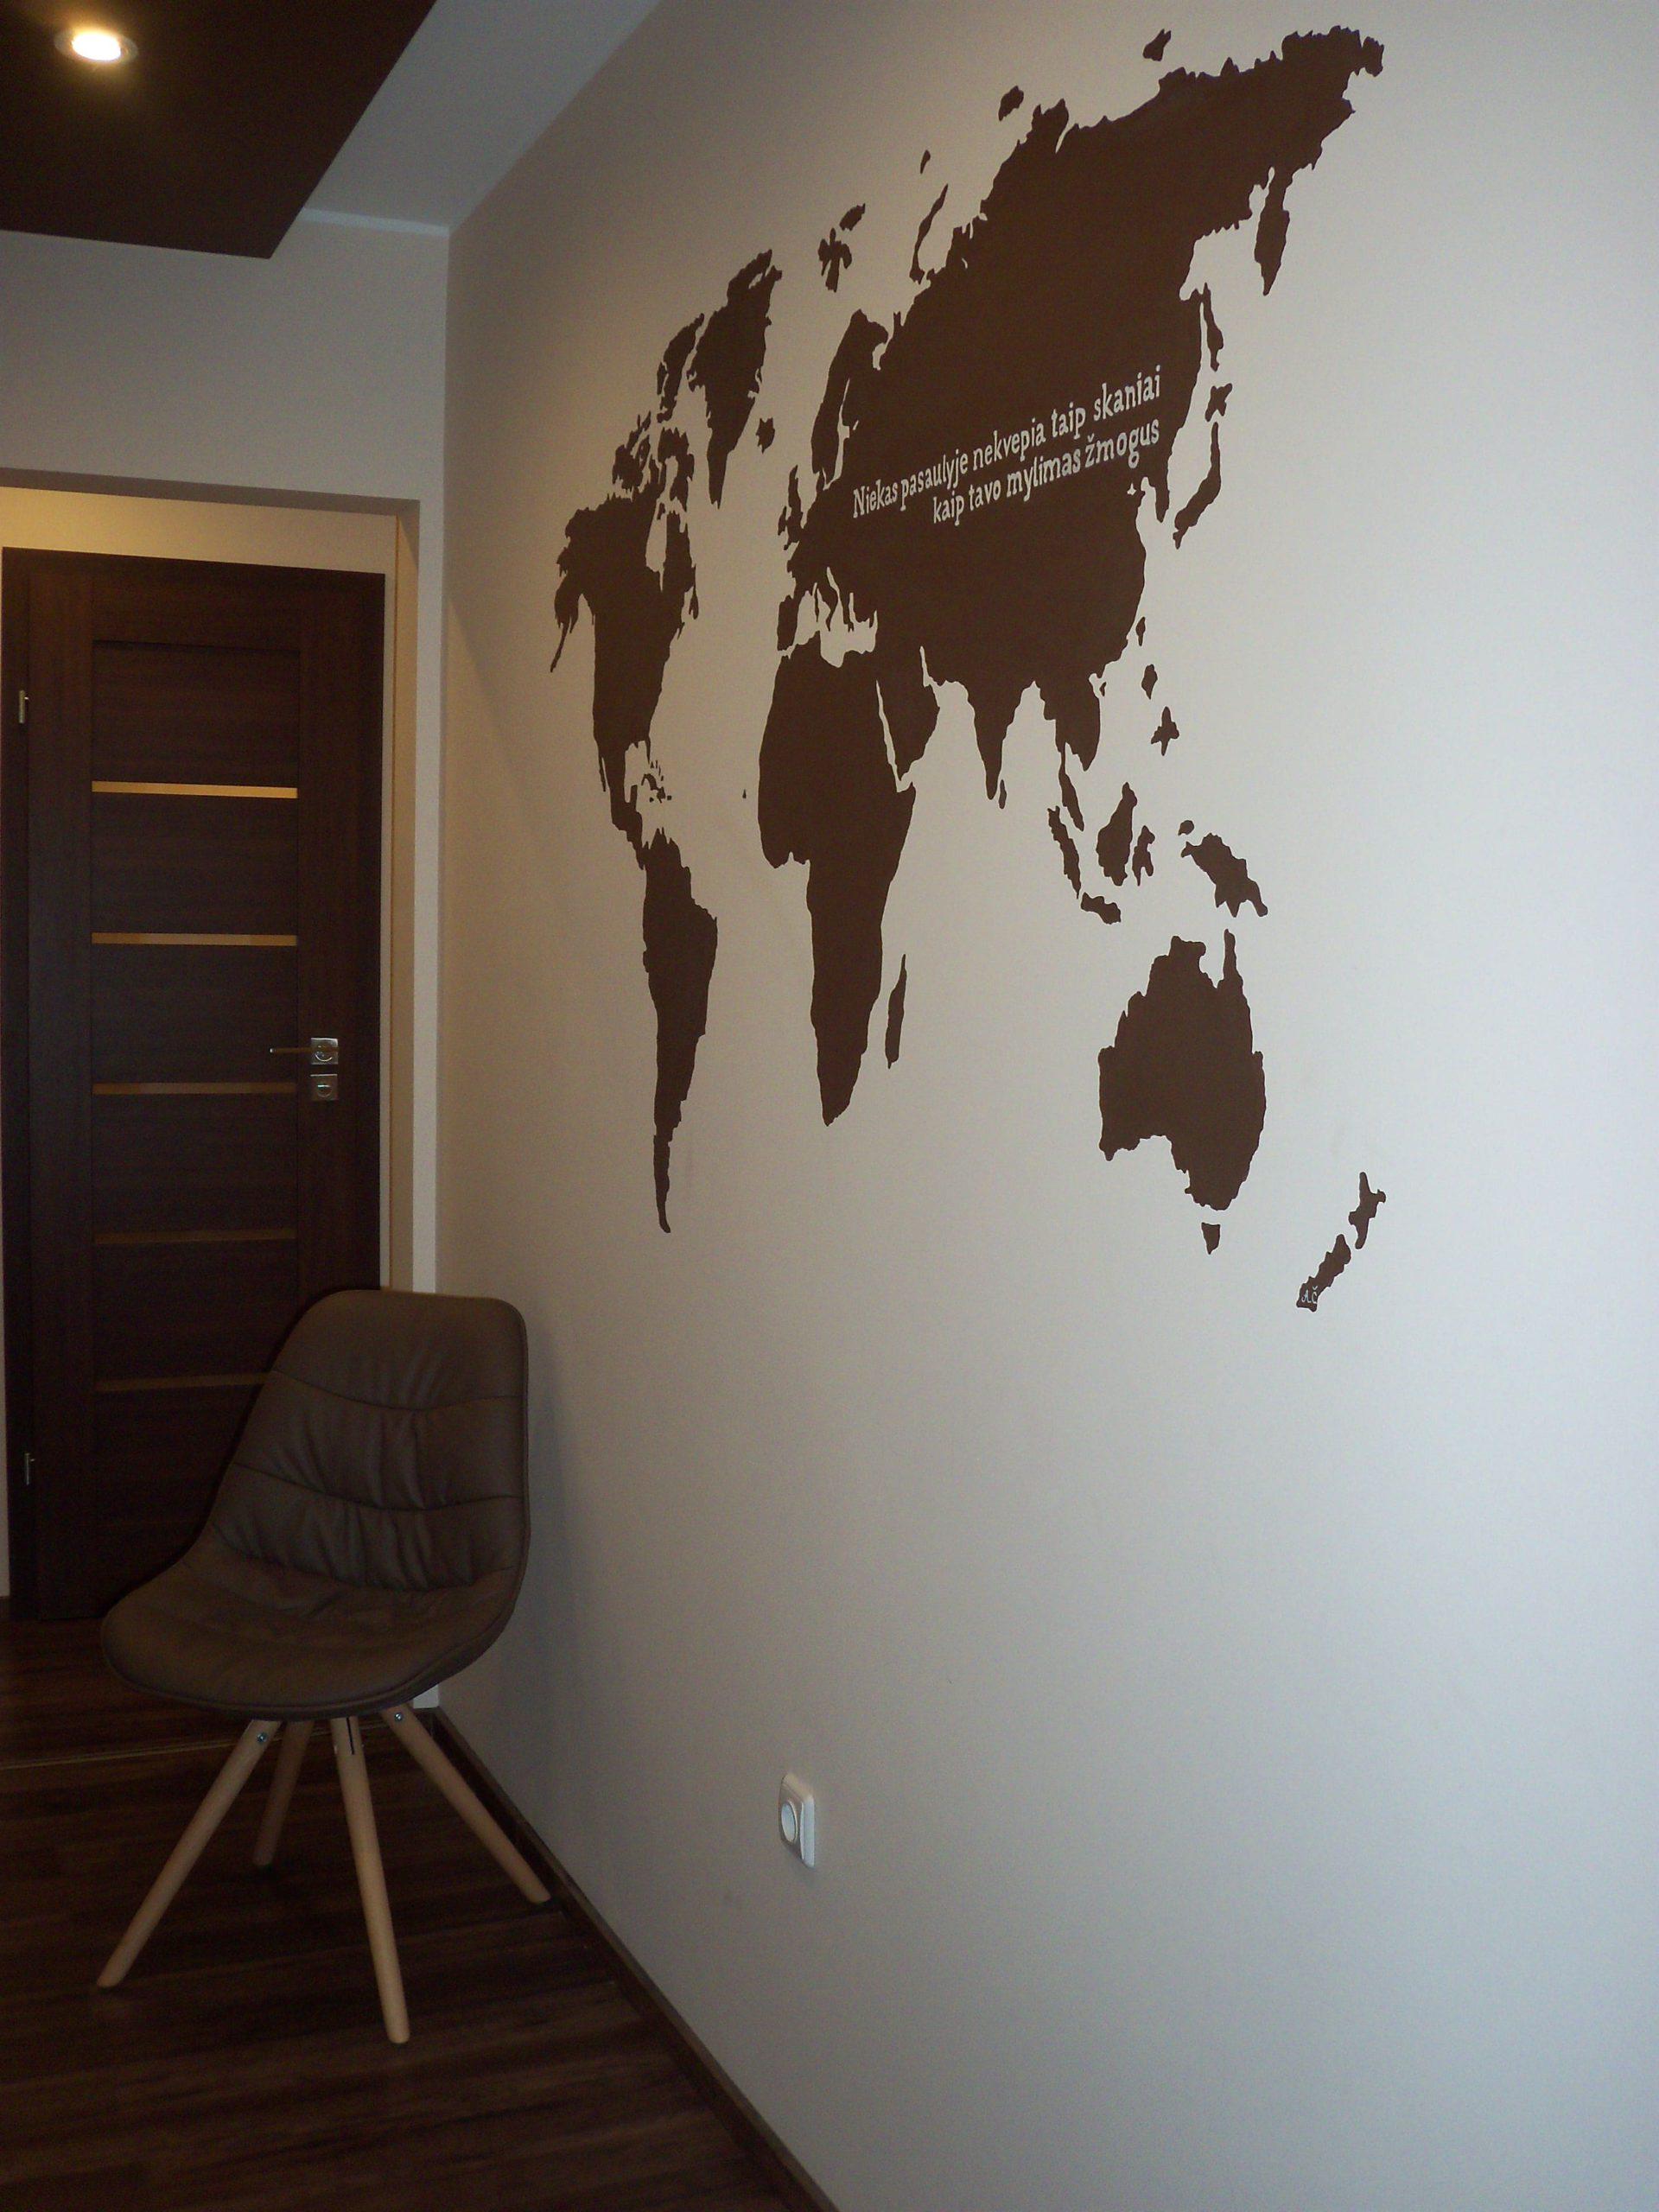 menine-kuryba-sienu-dekoravimas-ivairus-interjerai (32)